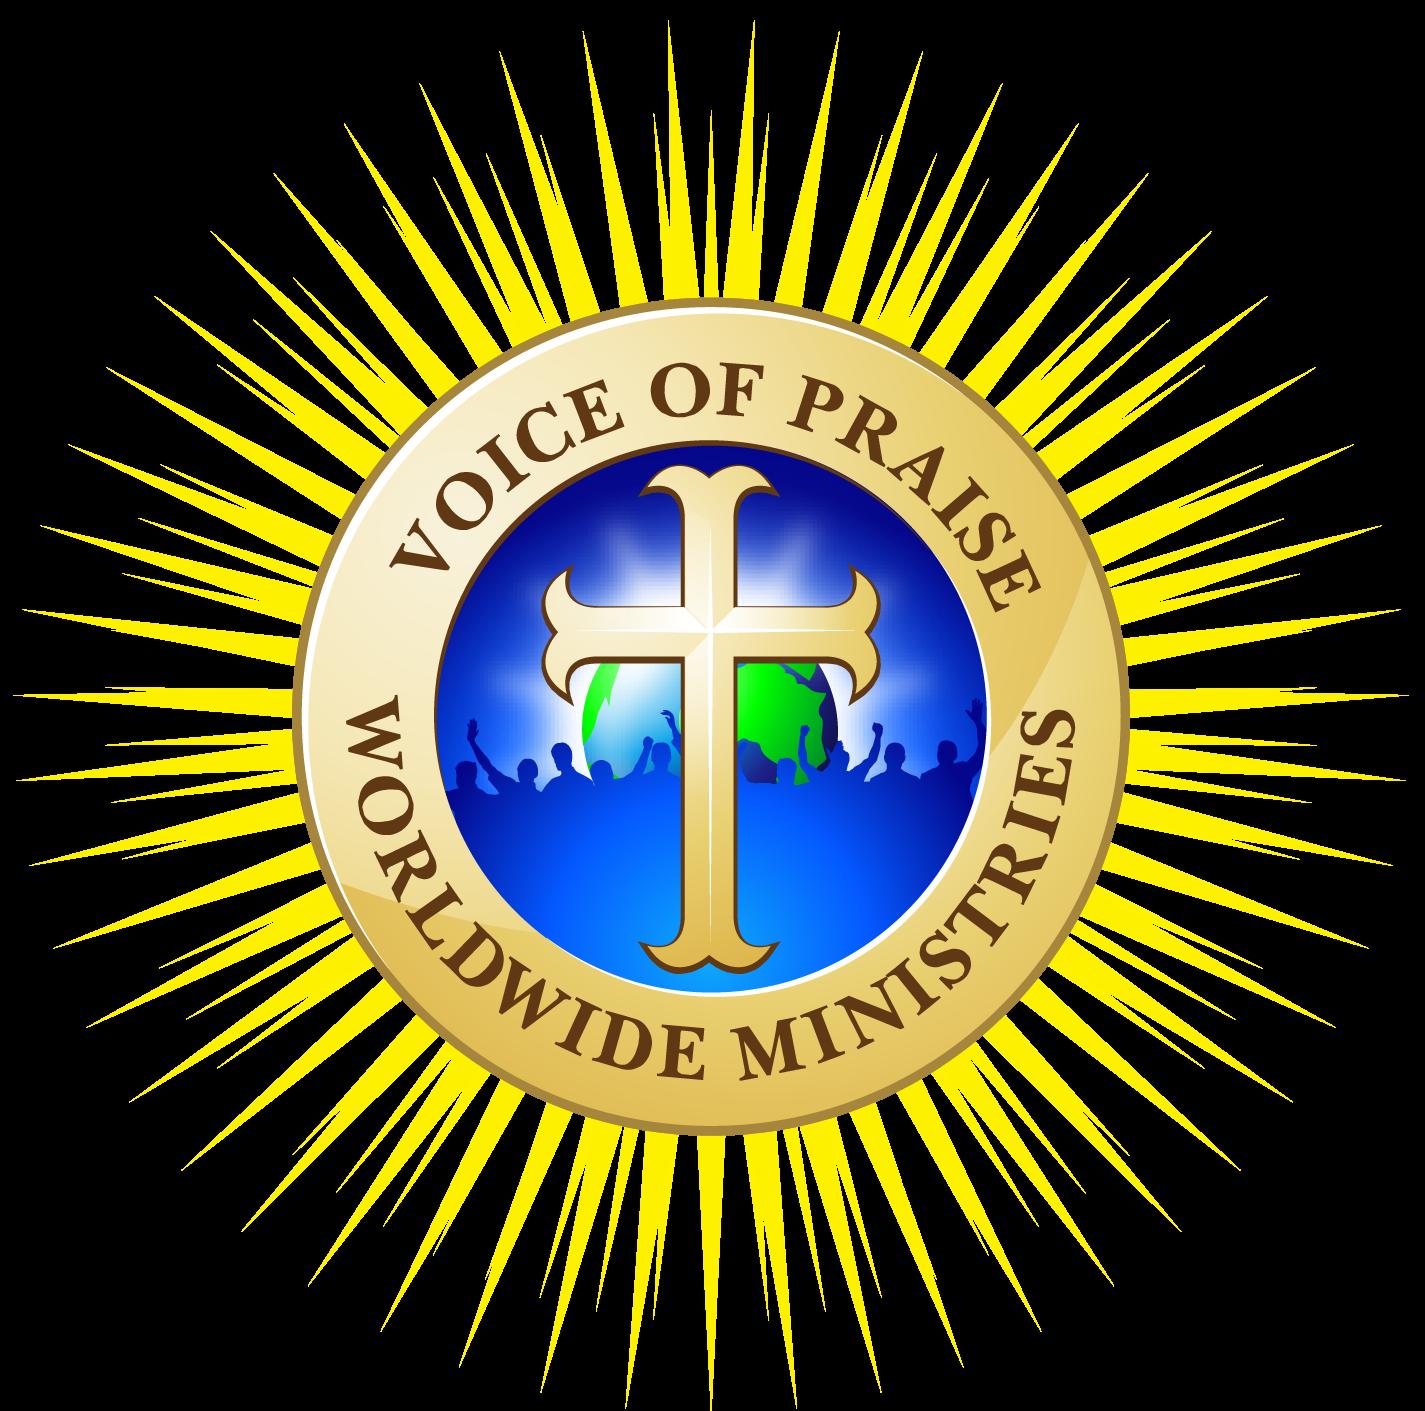 Voice of Praise Worldwide Ministries